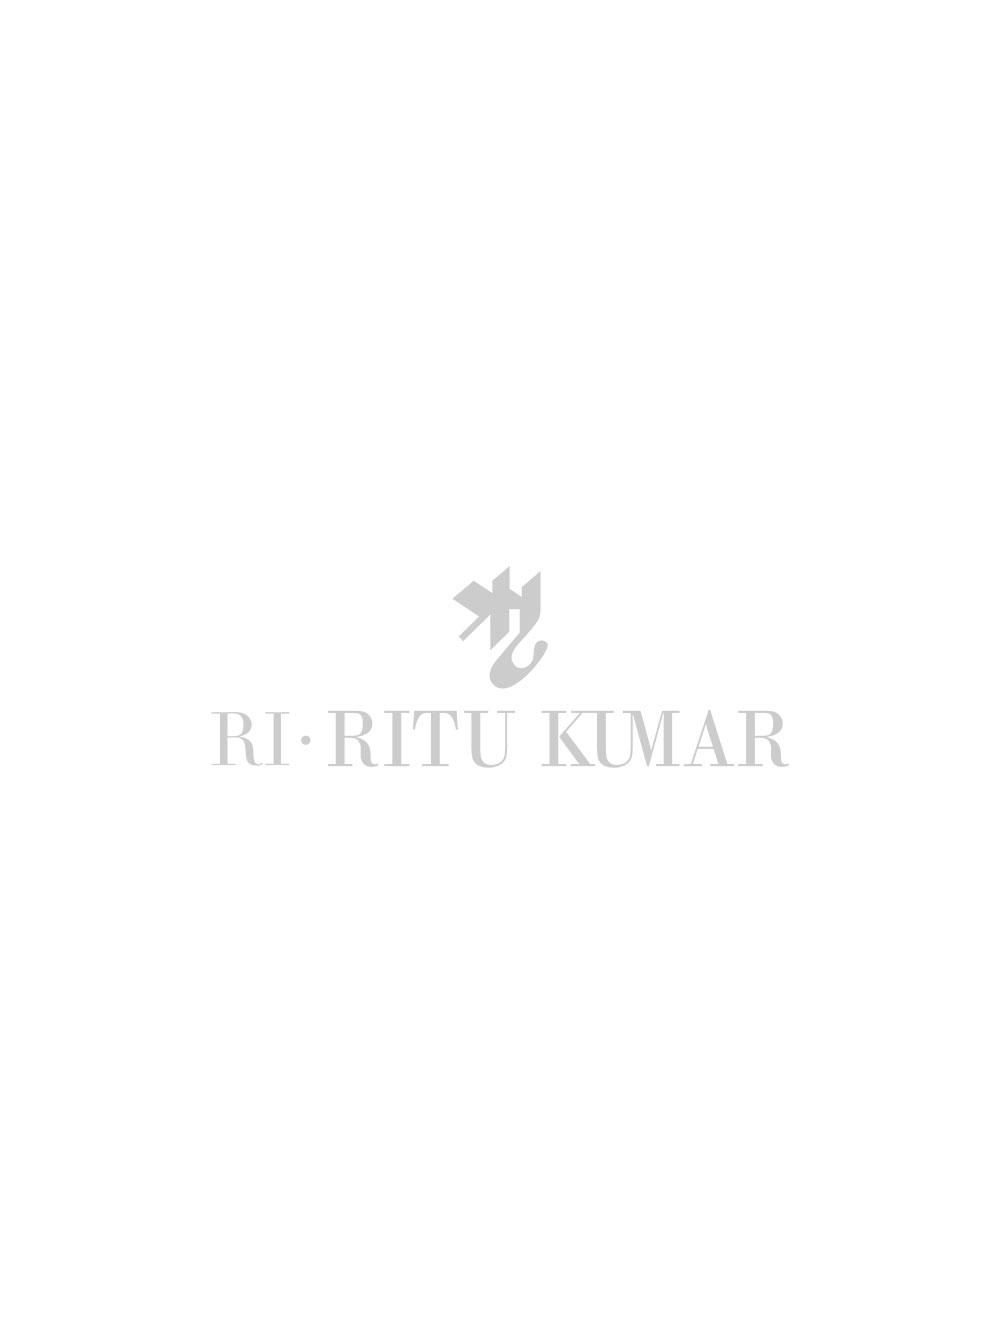 Royal Blue Embroidered Double Layered Kurta With Dupatta And Churidar